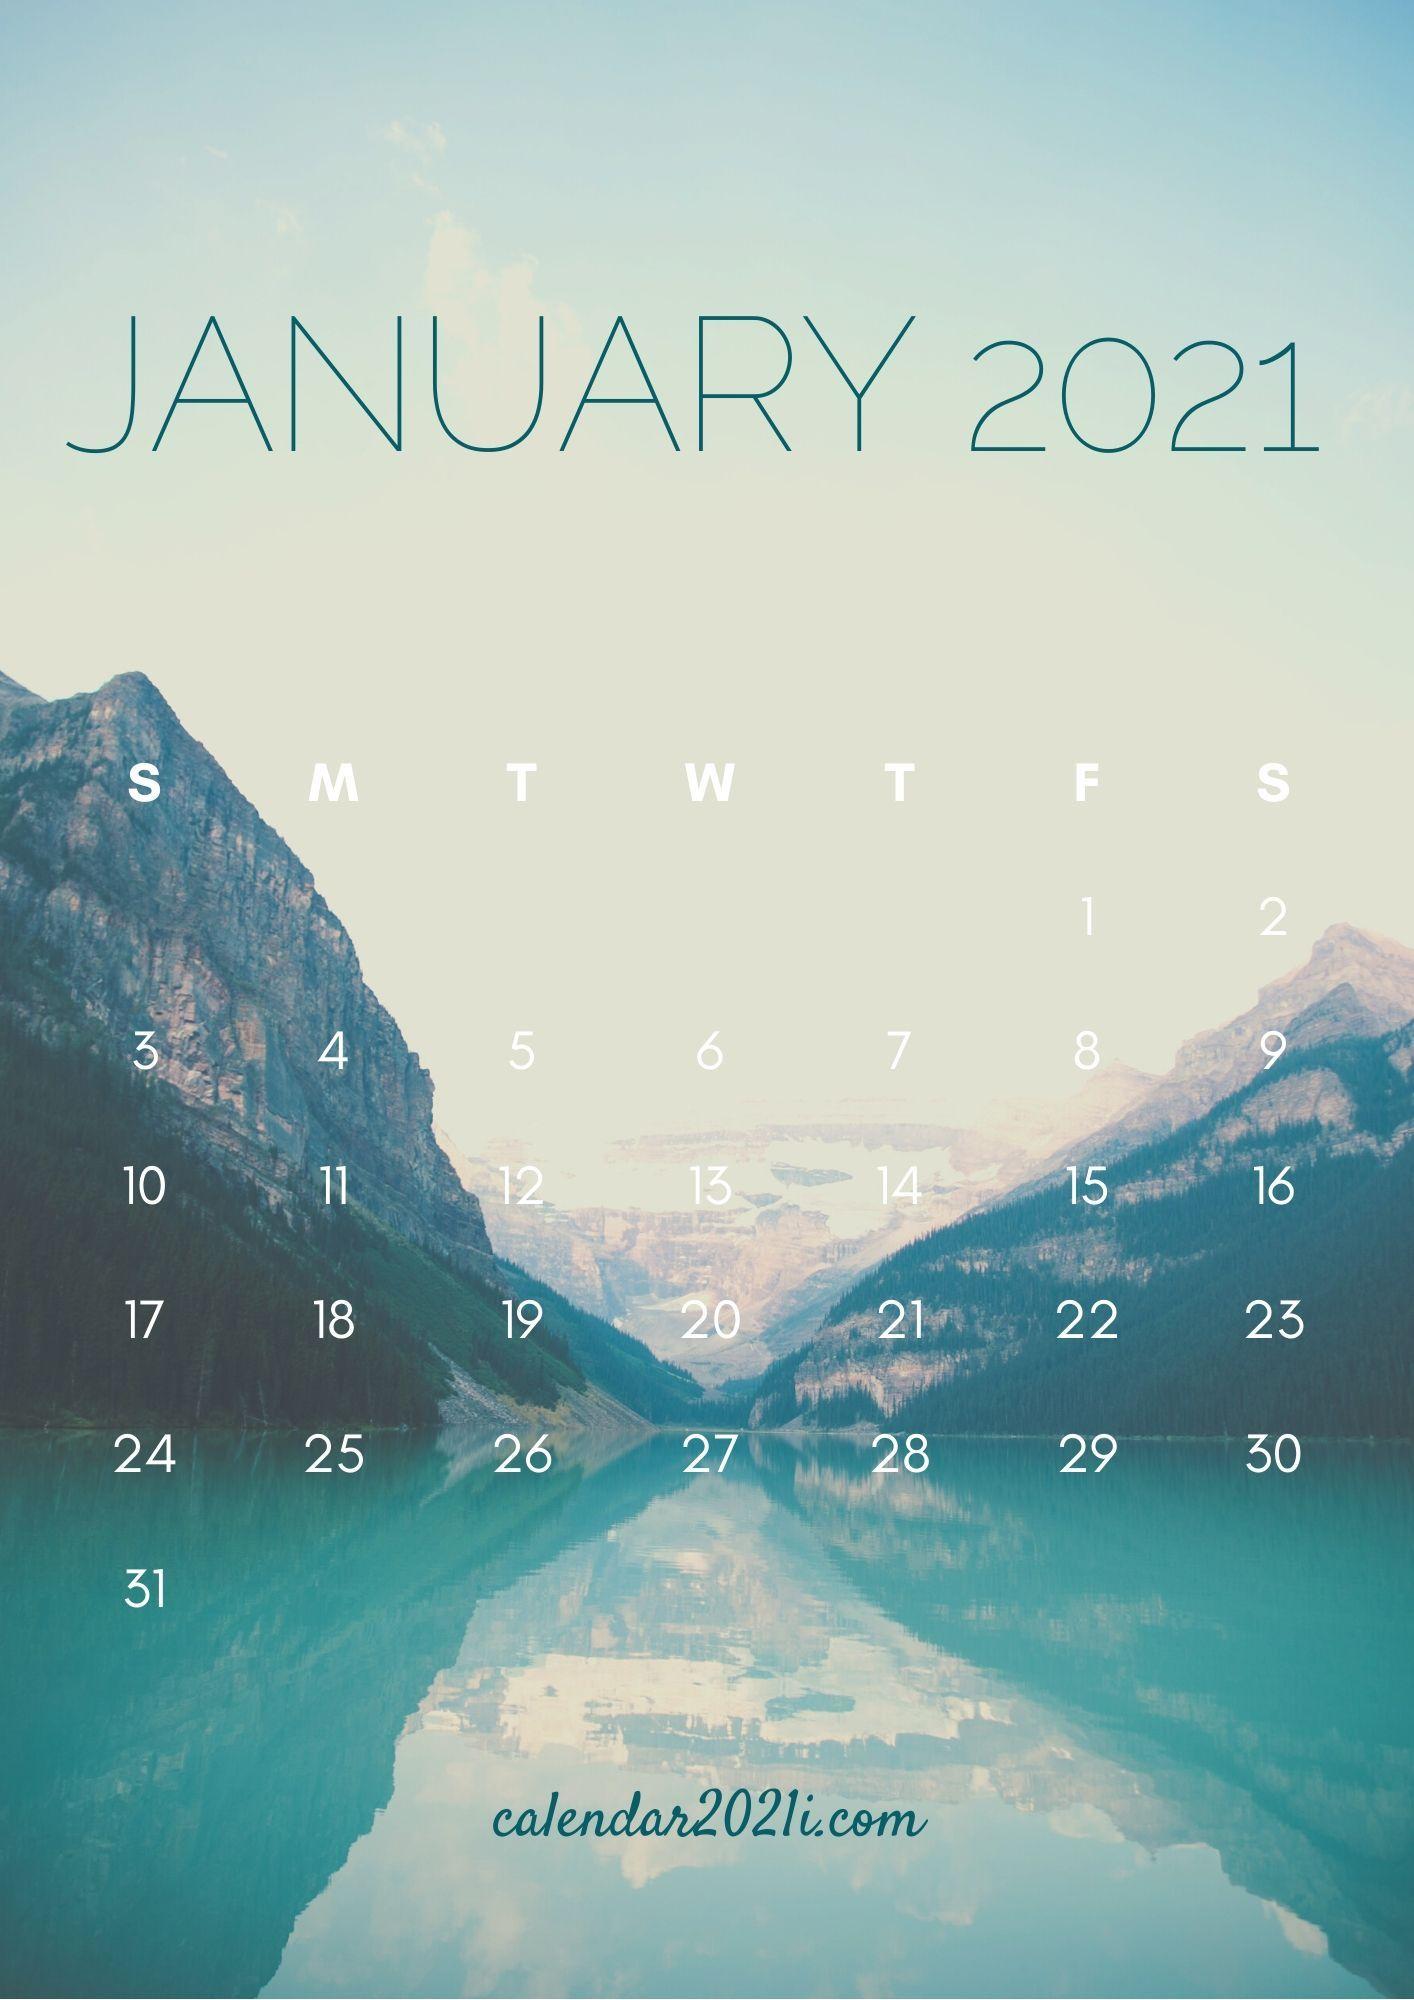 January 2021 Calendar iPhone HD Wallpaper for home screen 1414x2000